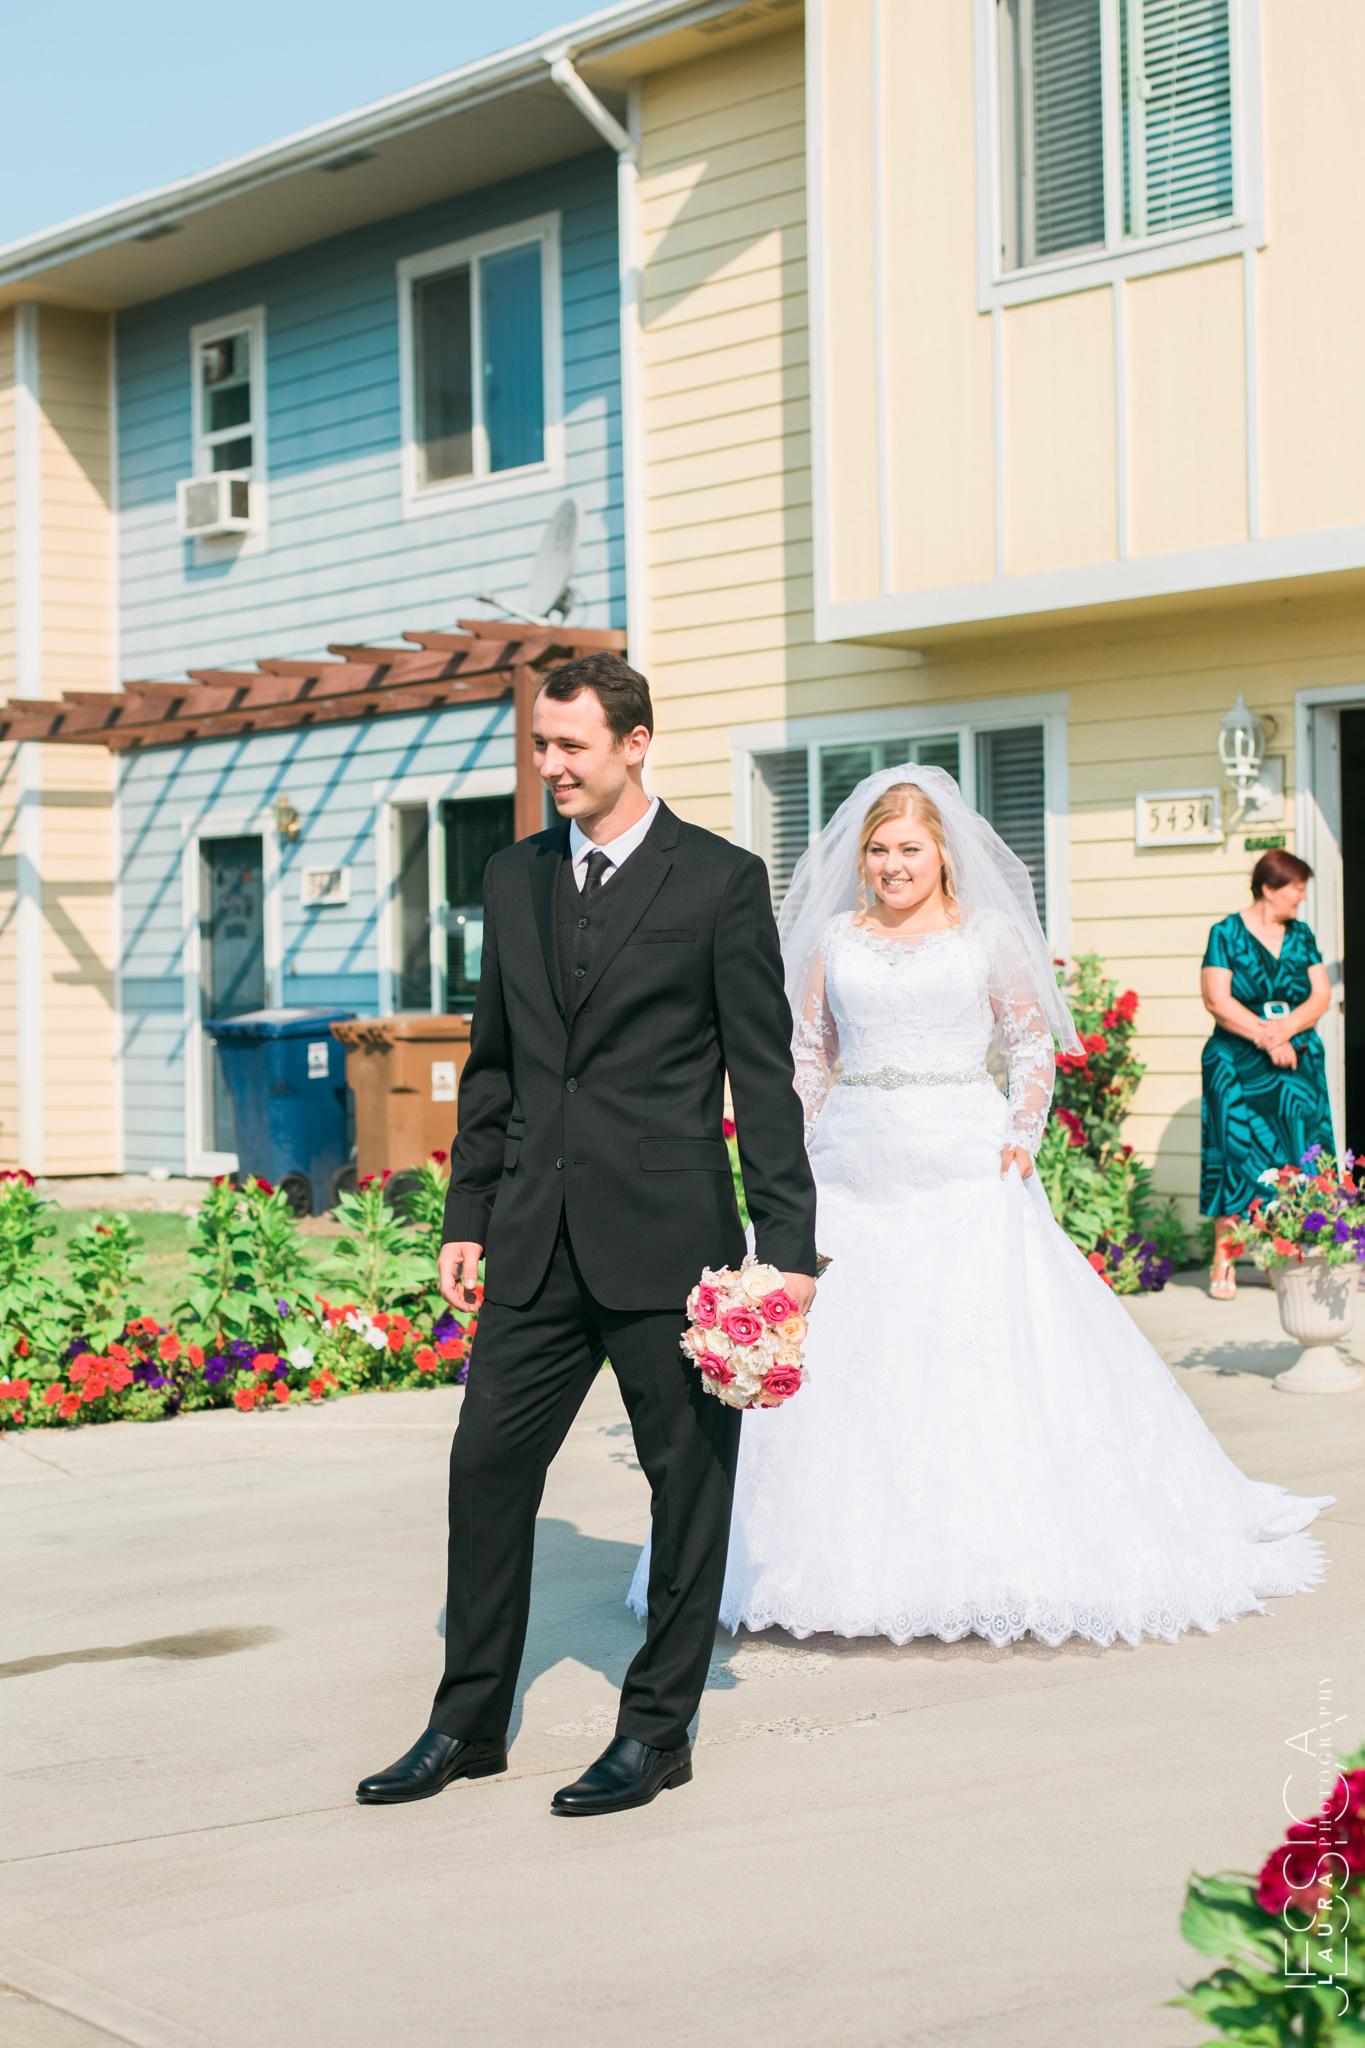 Eugene-Maryana_wedding_08062017_web (73 of 558).JPG